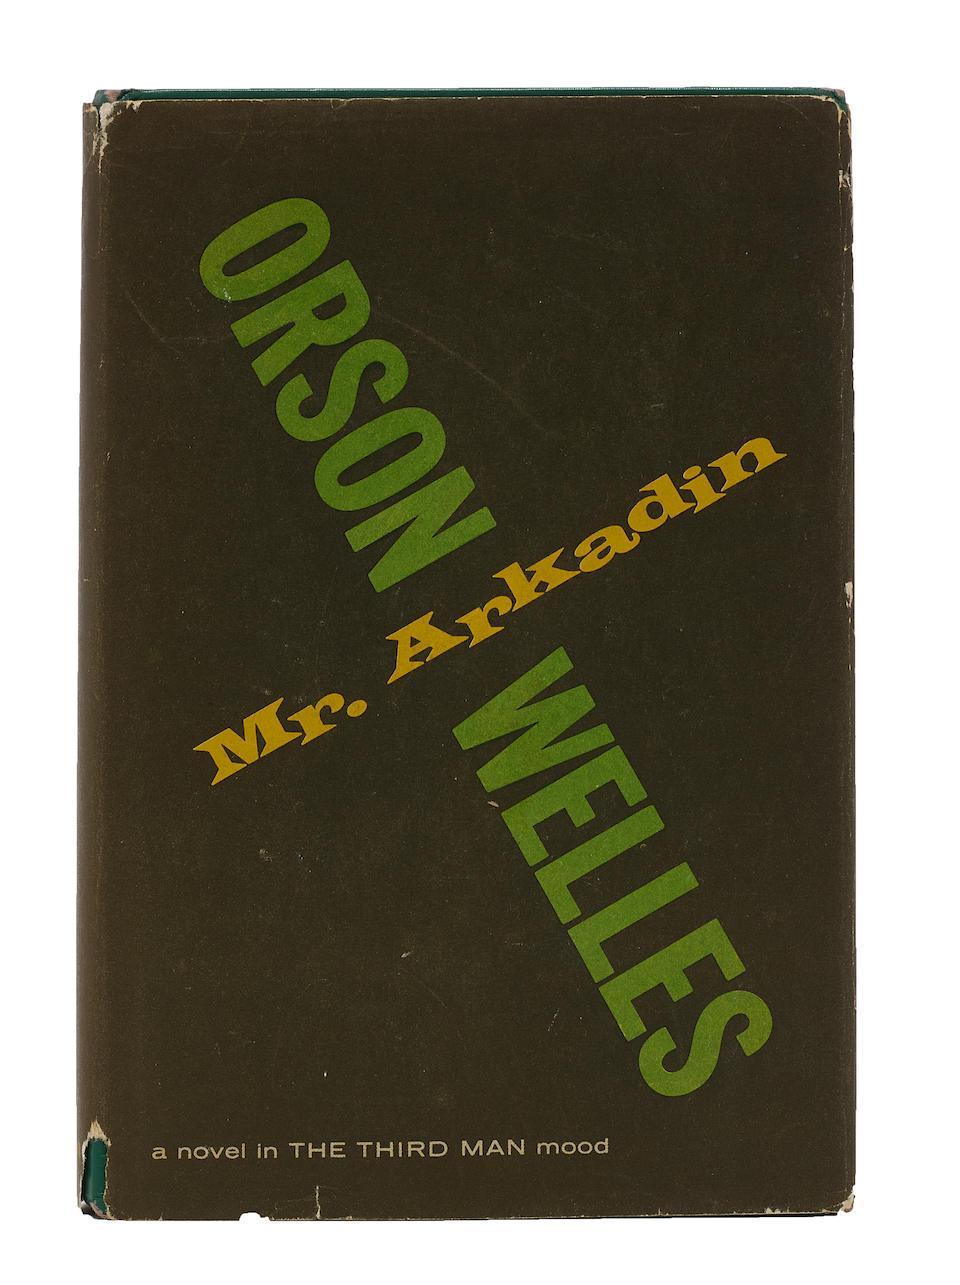 WELLES, ORSON. 1915-1985.  Mr. Arkadin. New York: Thomas Y. Crowell Co, 1956.